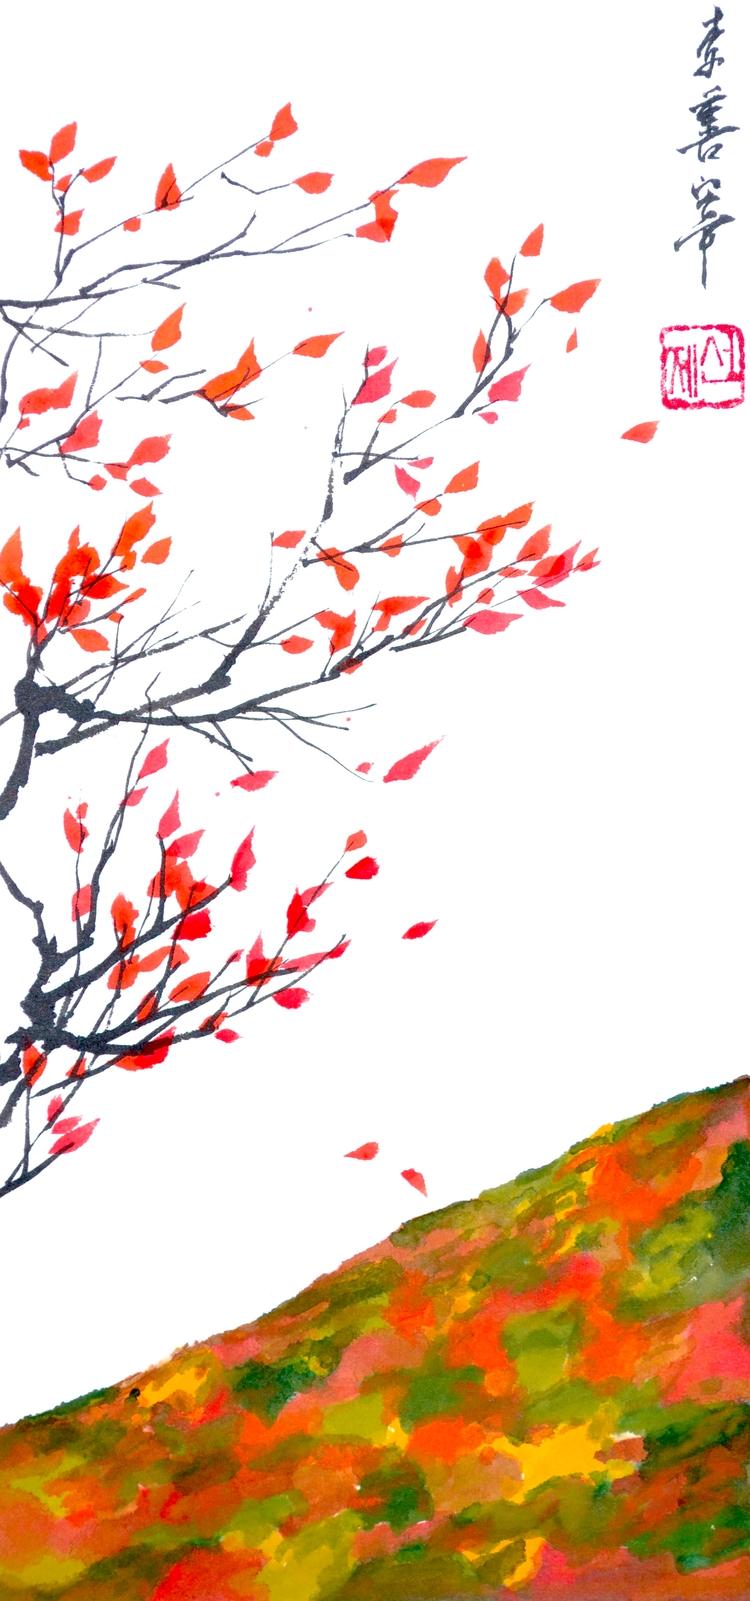 Fall coming - eugenesunjae | ello